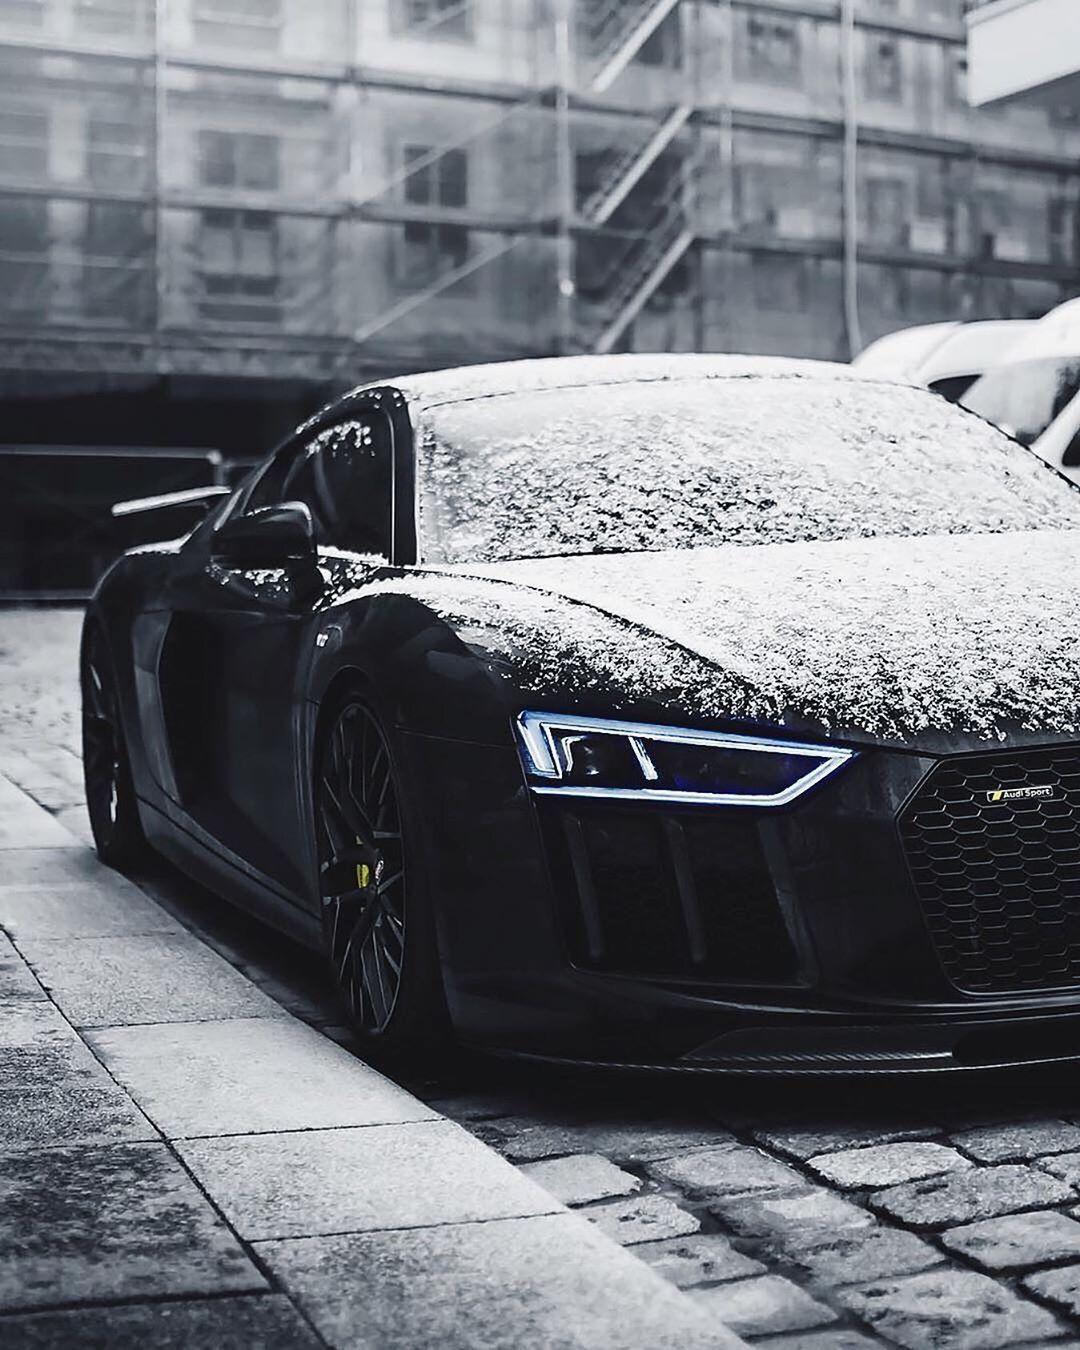 Audi R8 Matte Black Price : matte, black, price, Black, Automotive